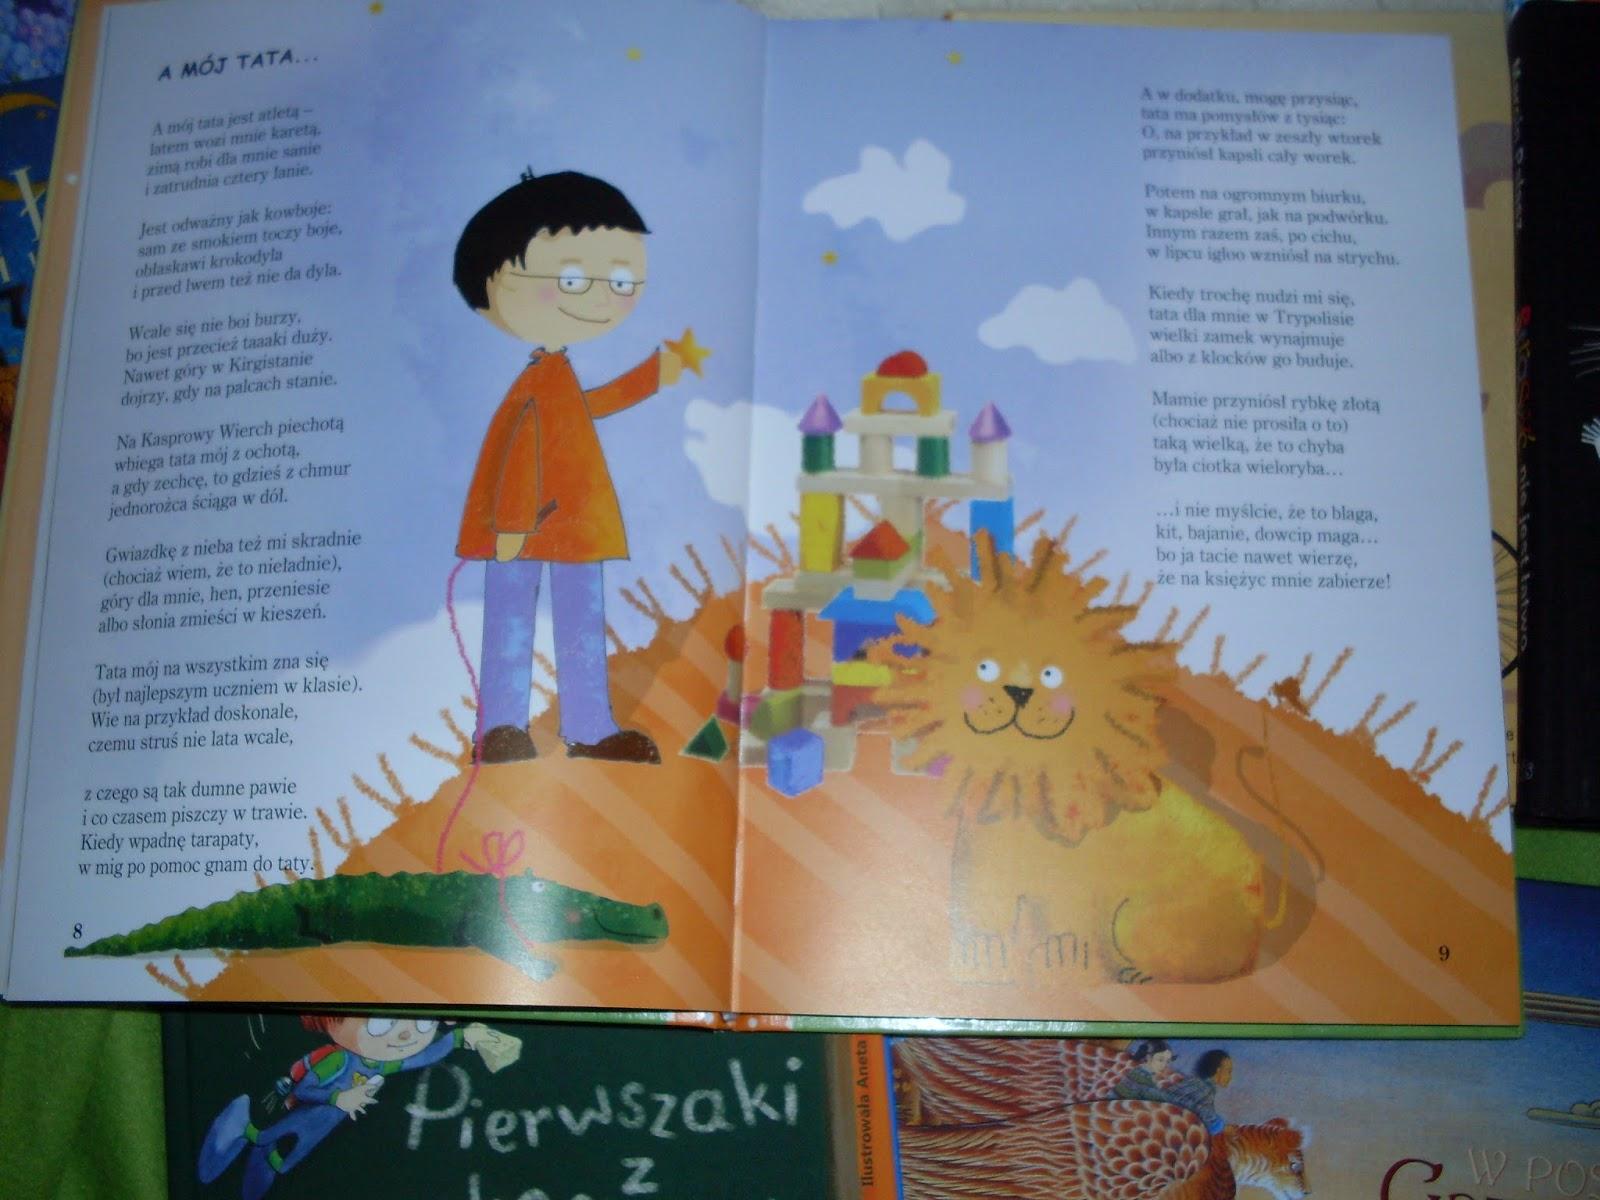 http://www.wydawnictwobis.com.pl/product.php?id=545